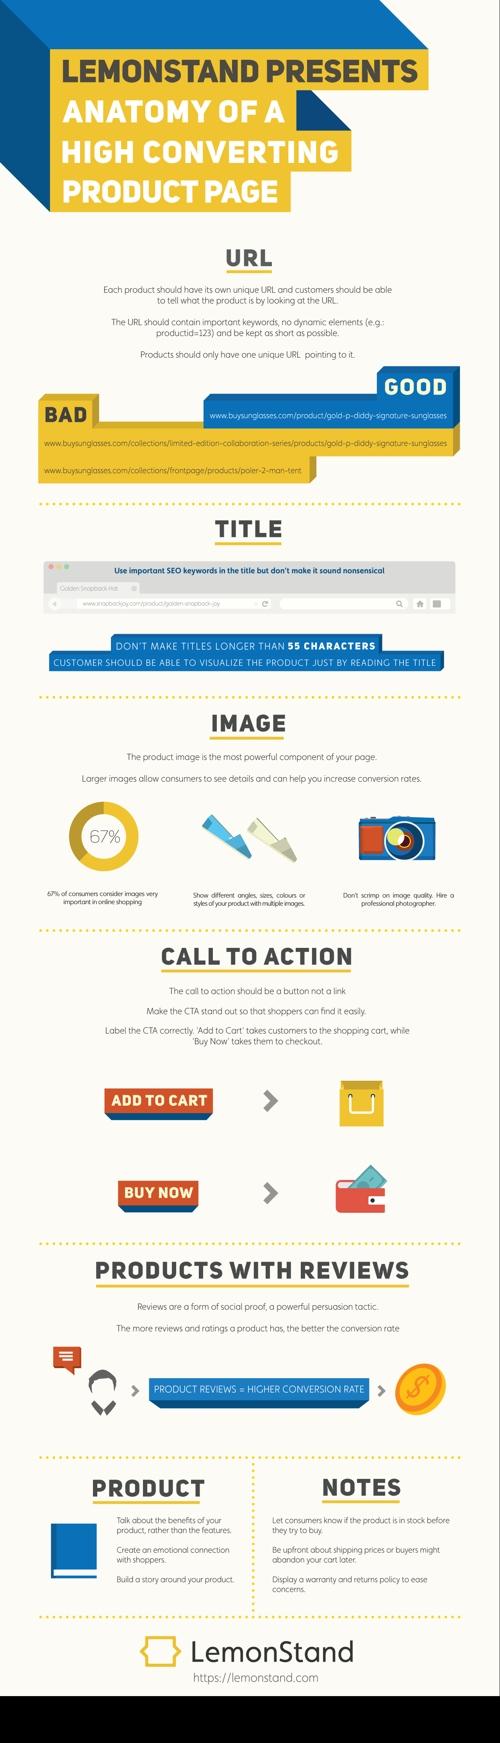 elementos-claves-pagina-producto-infografia